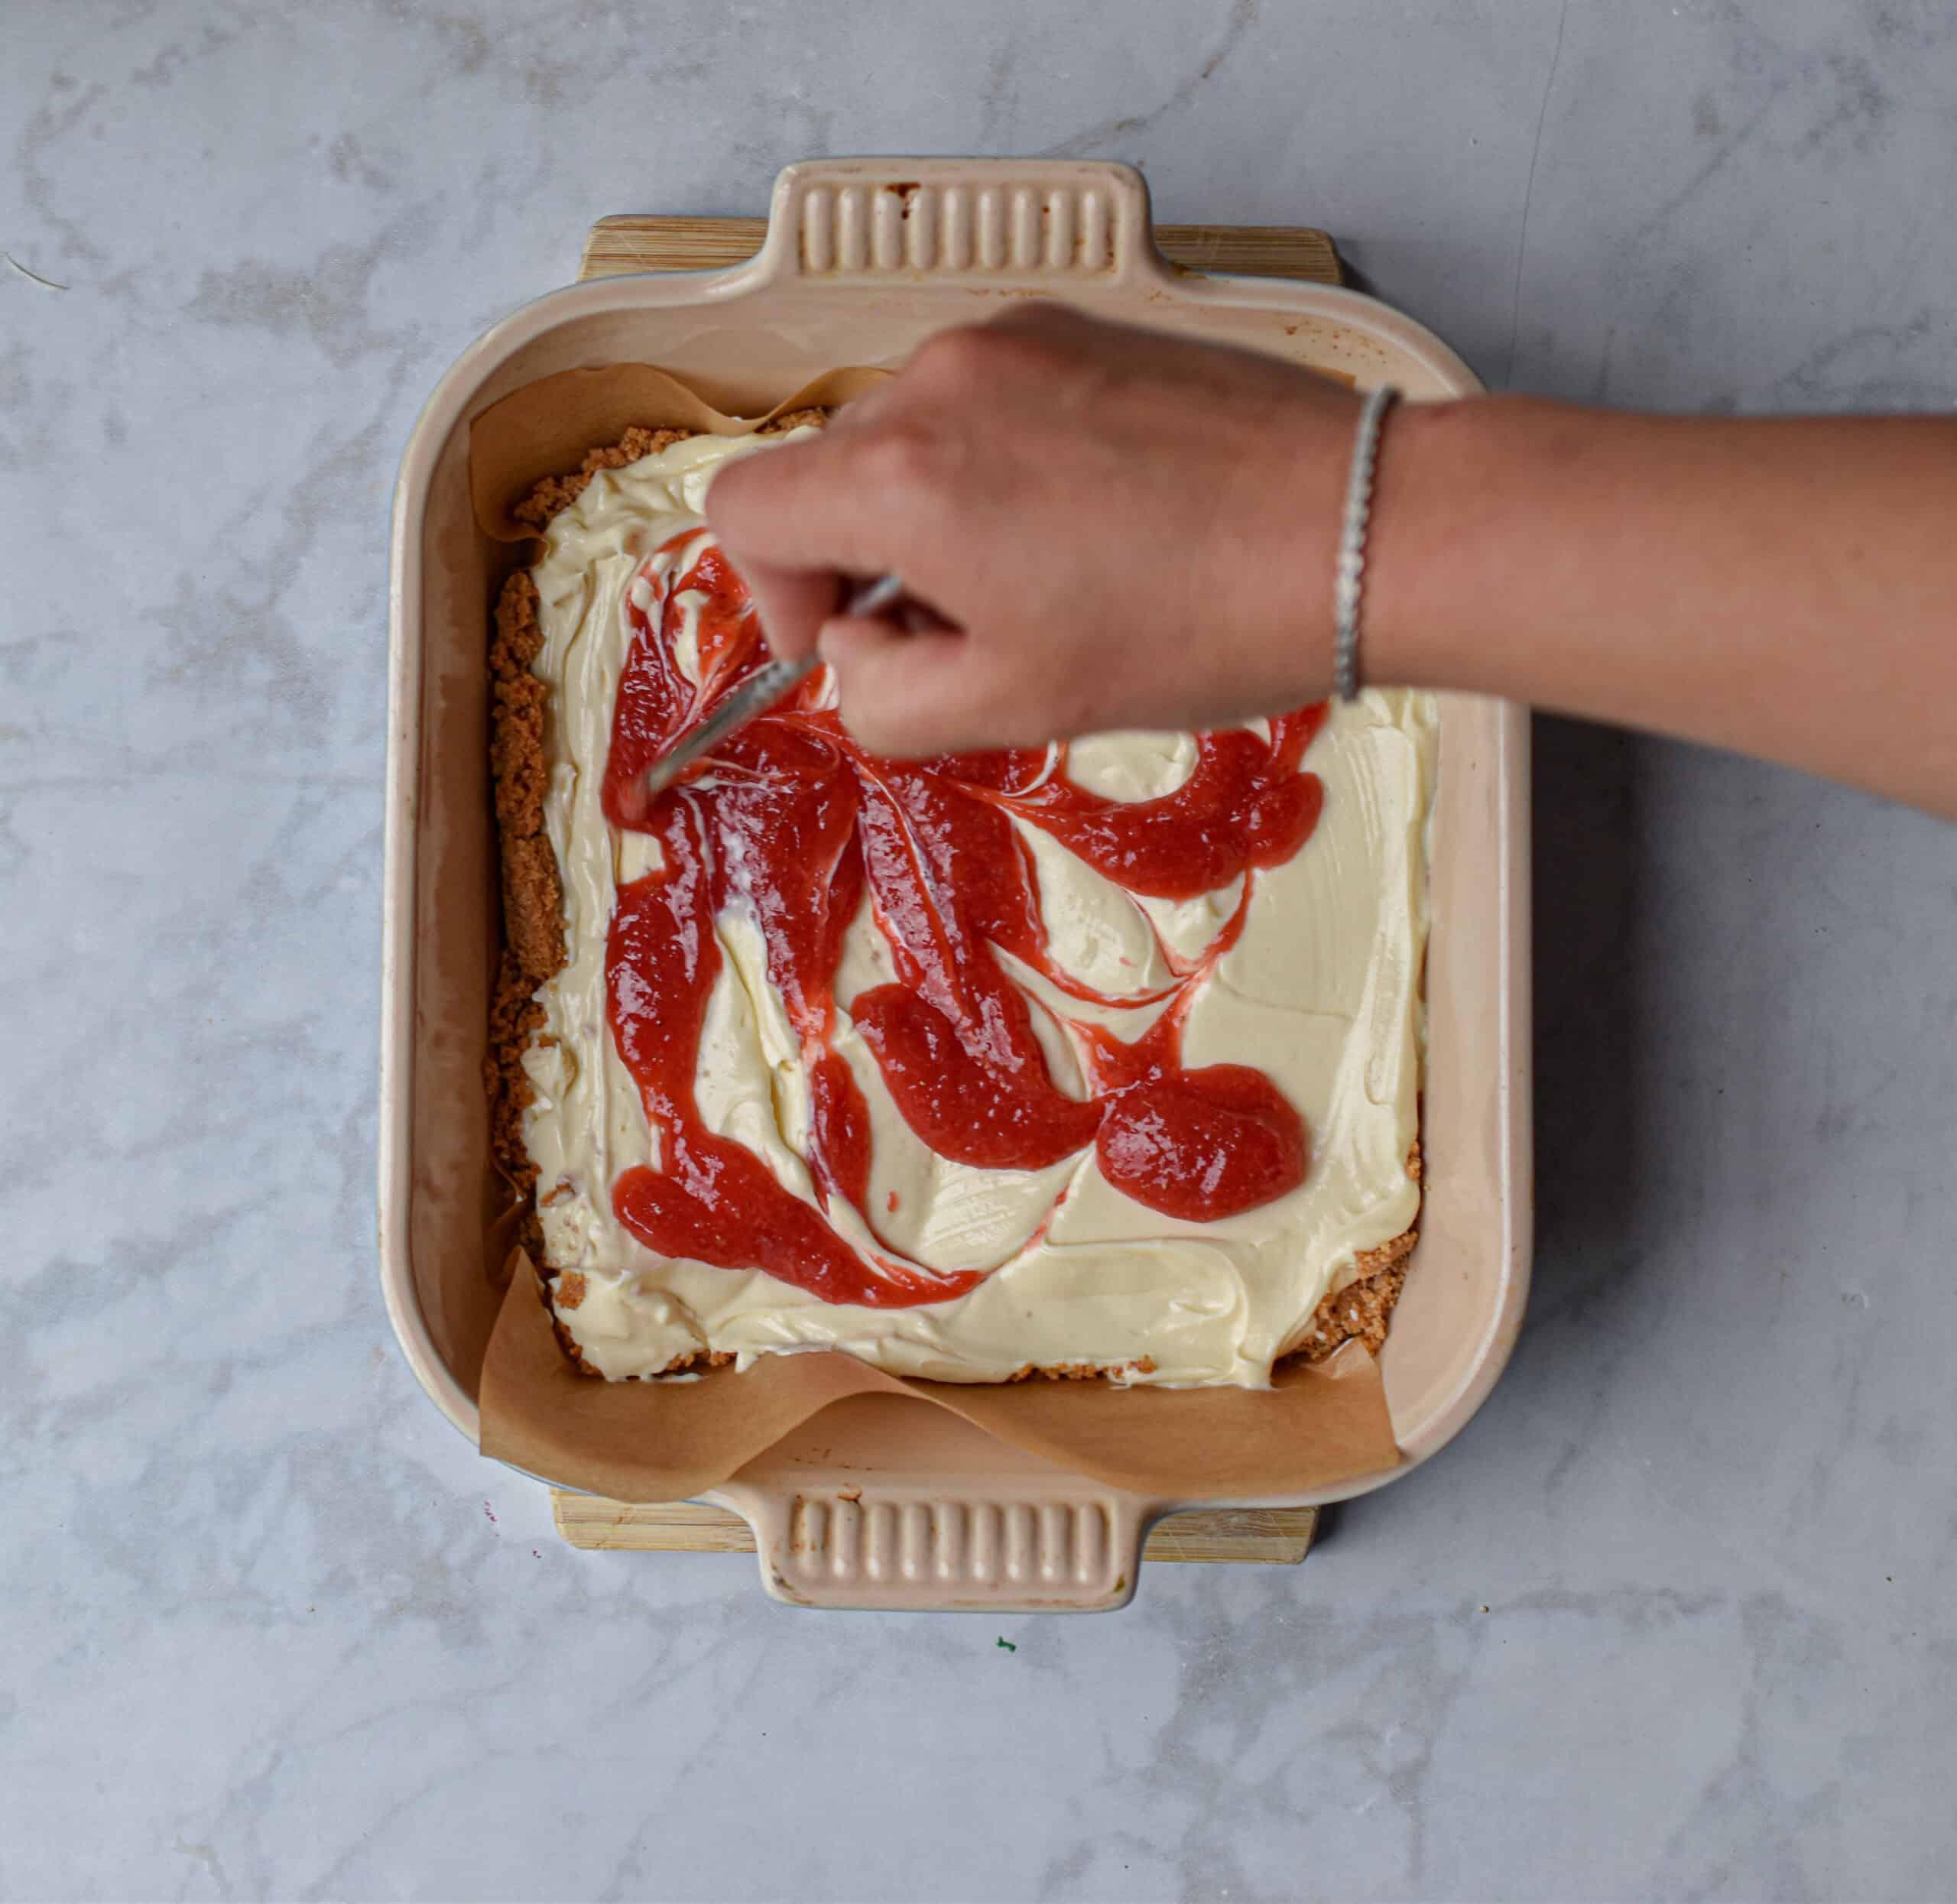 Swirl the strawberry puree into the cheesecake mixture